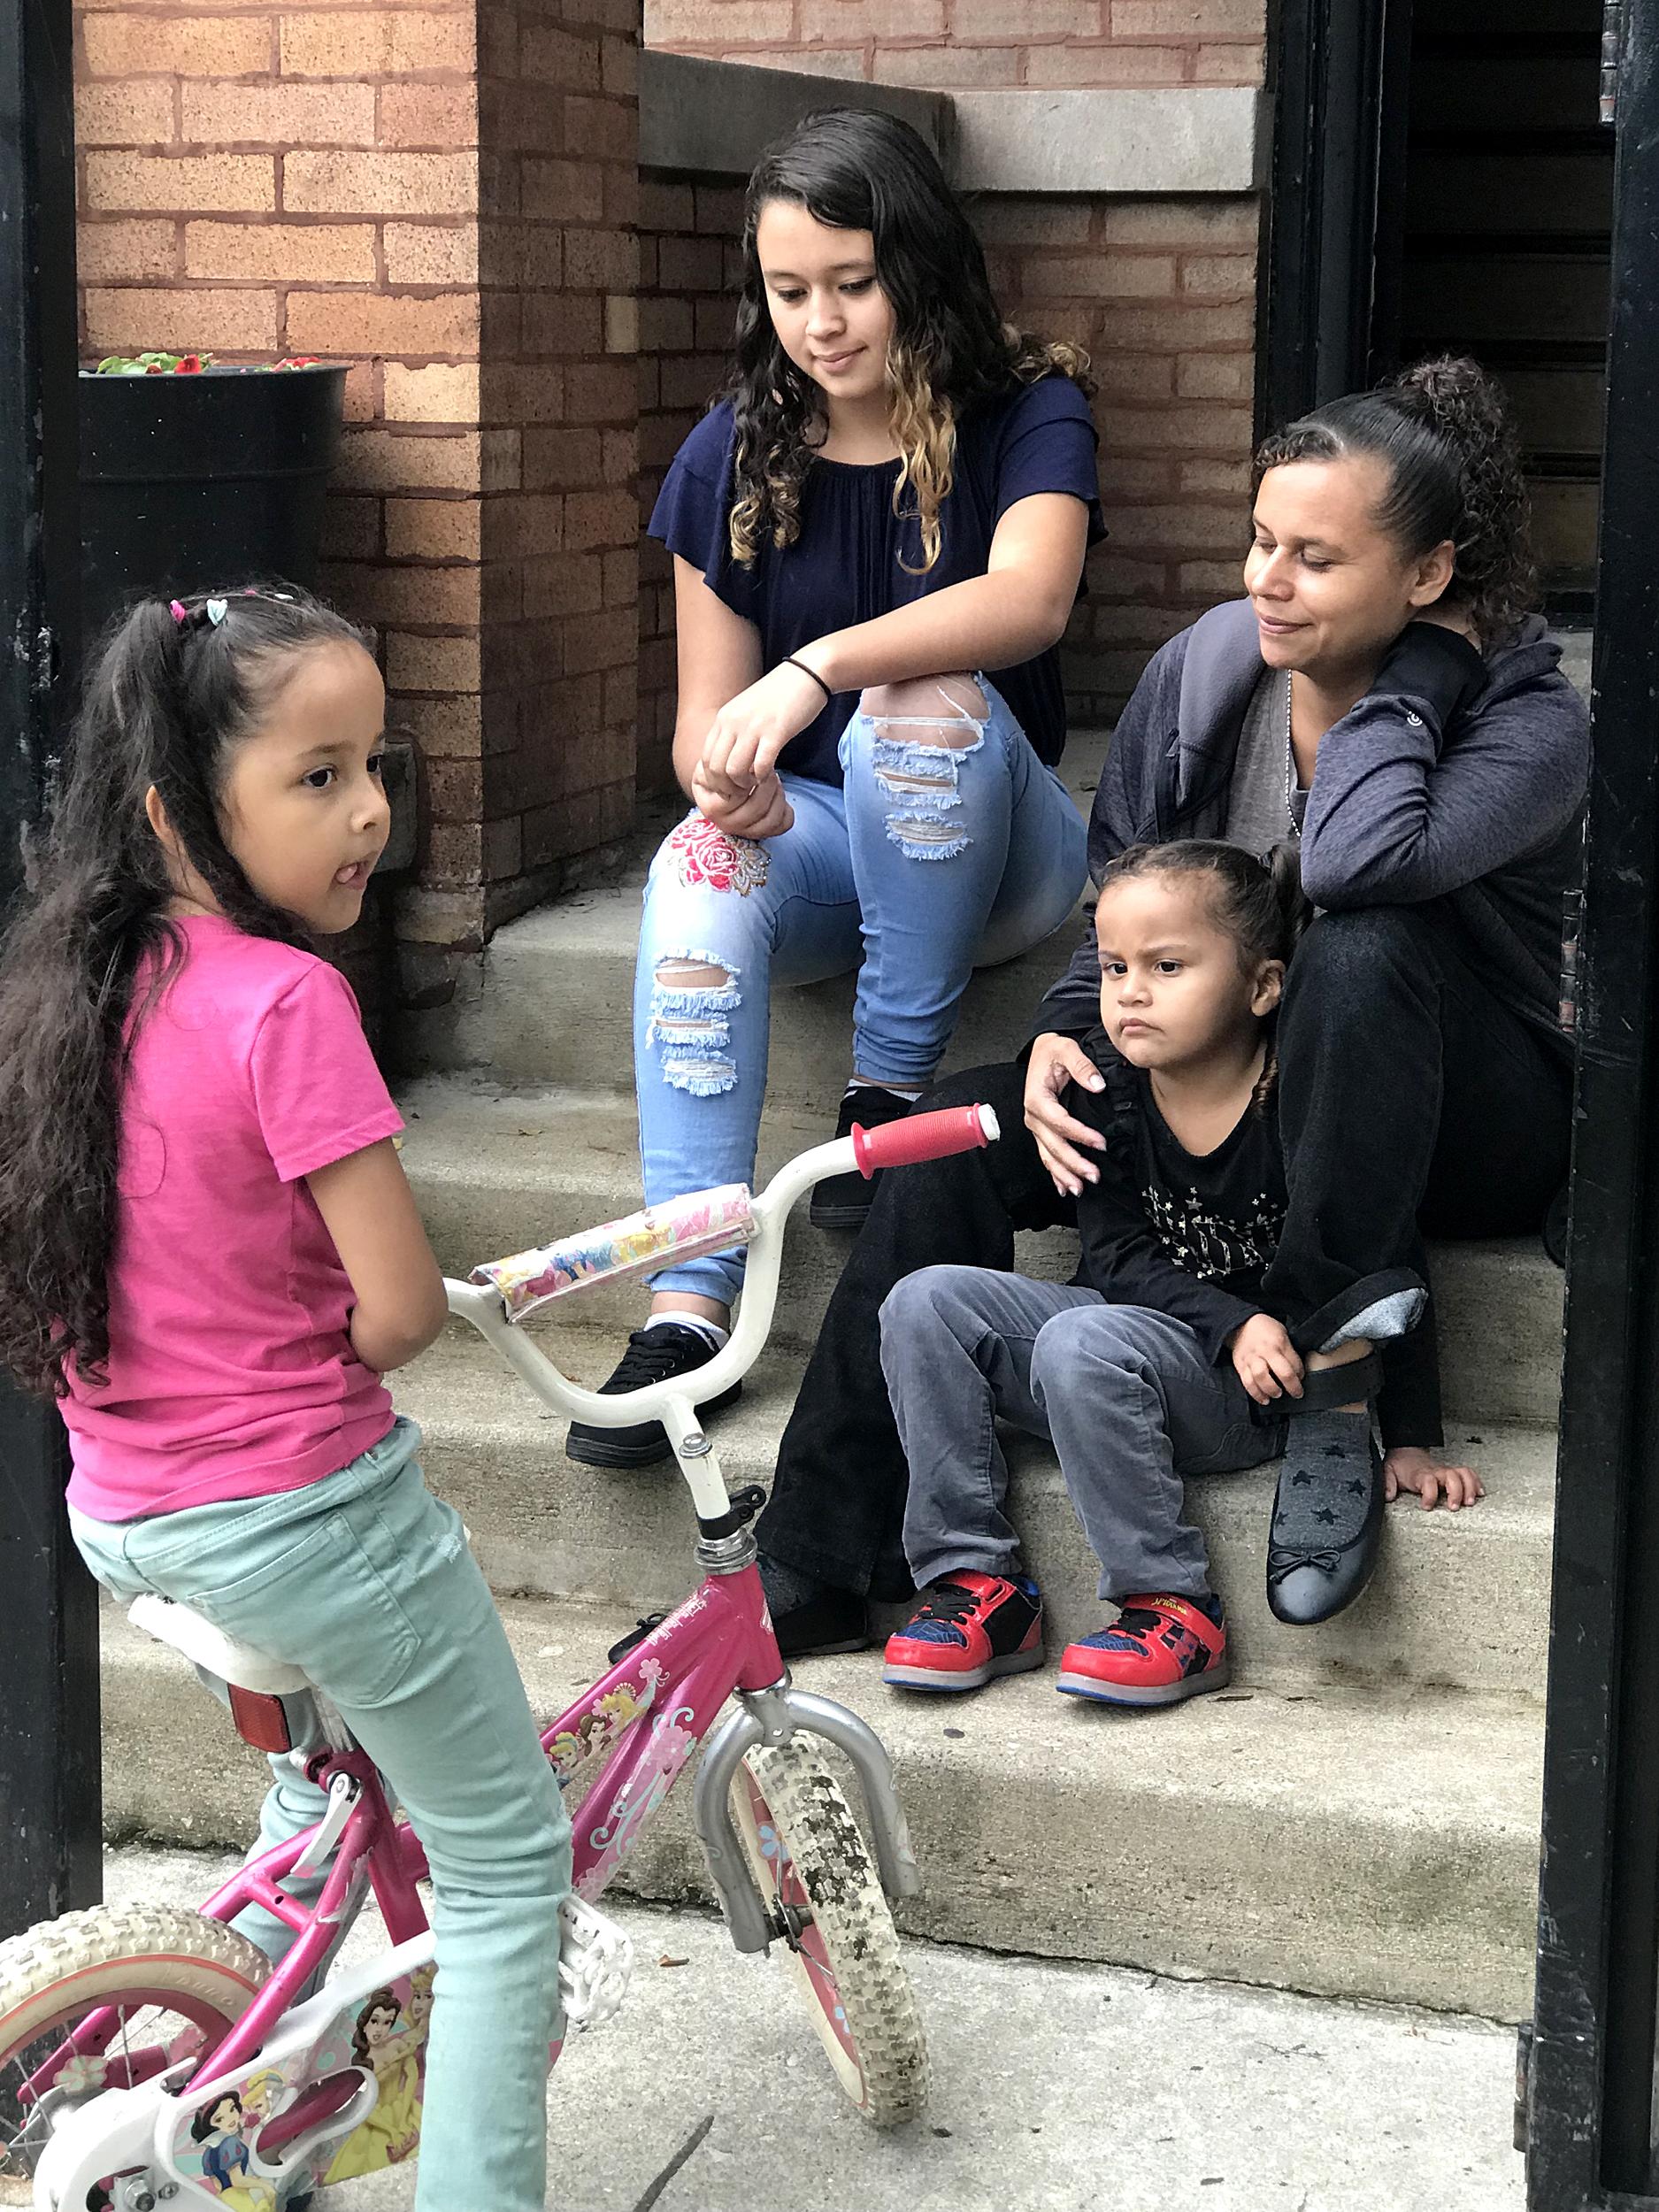 Seeking-asylum,-migrant-caravan-mom-calls-for-family-reunification